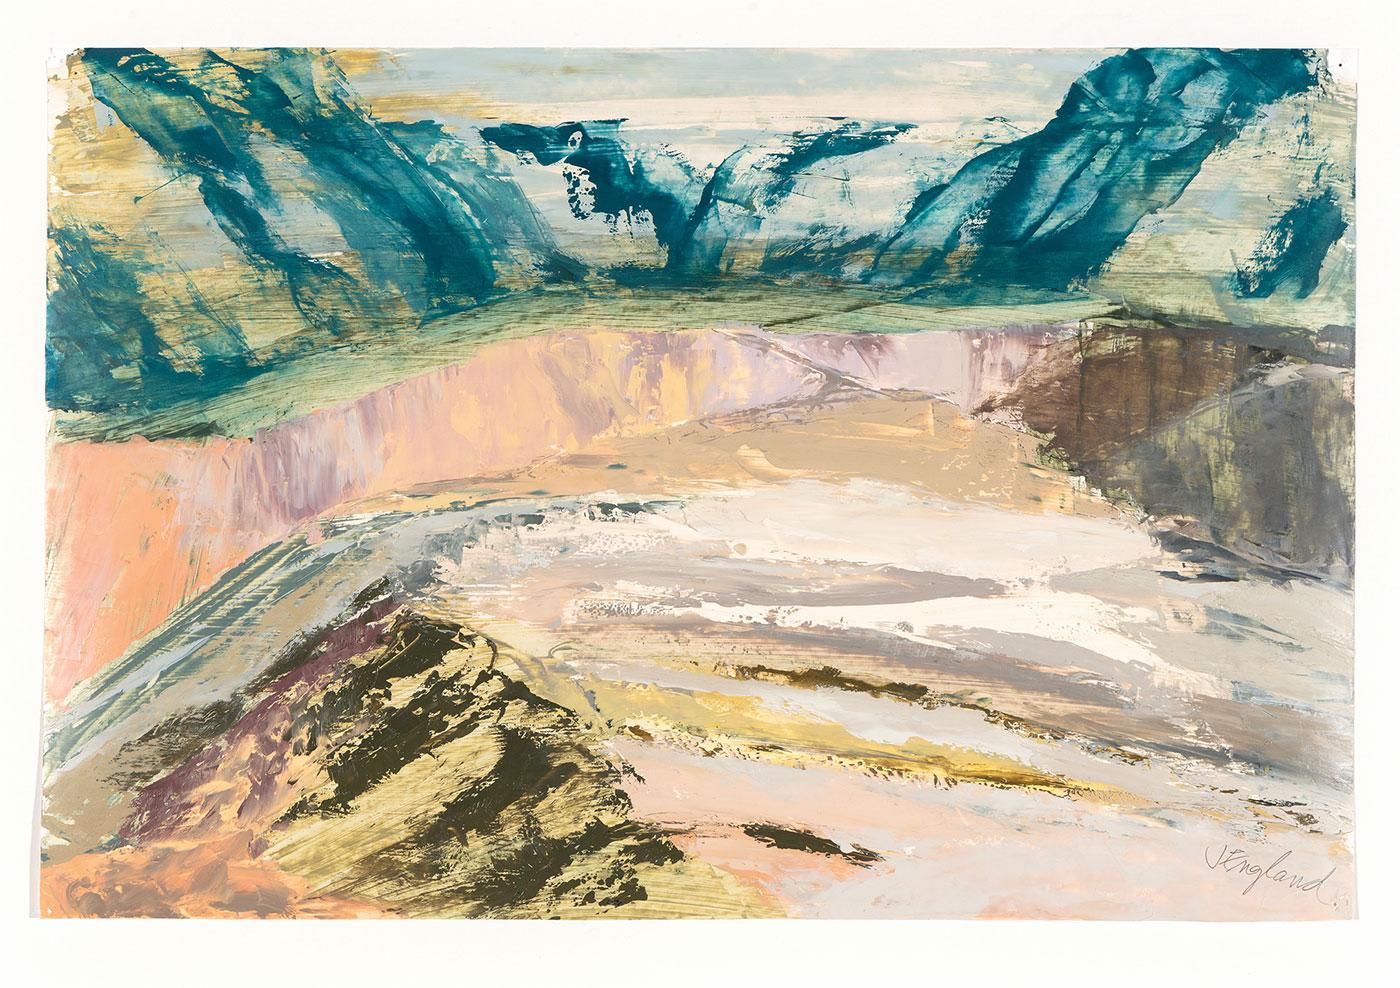 Julie S. England - Rio Grande Near Taos